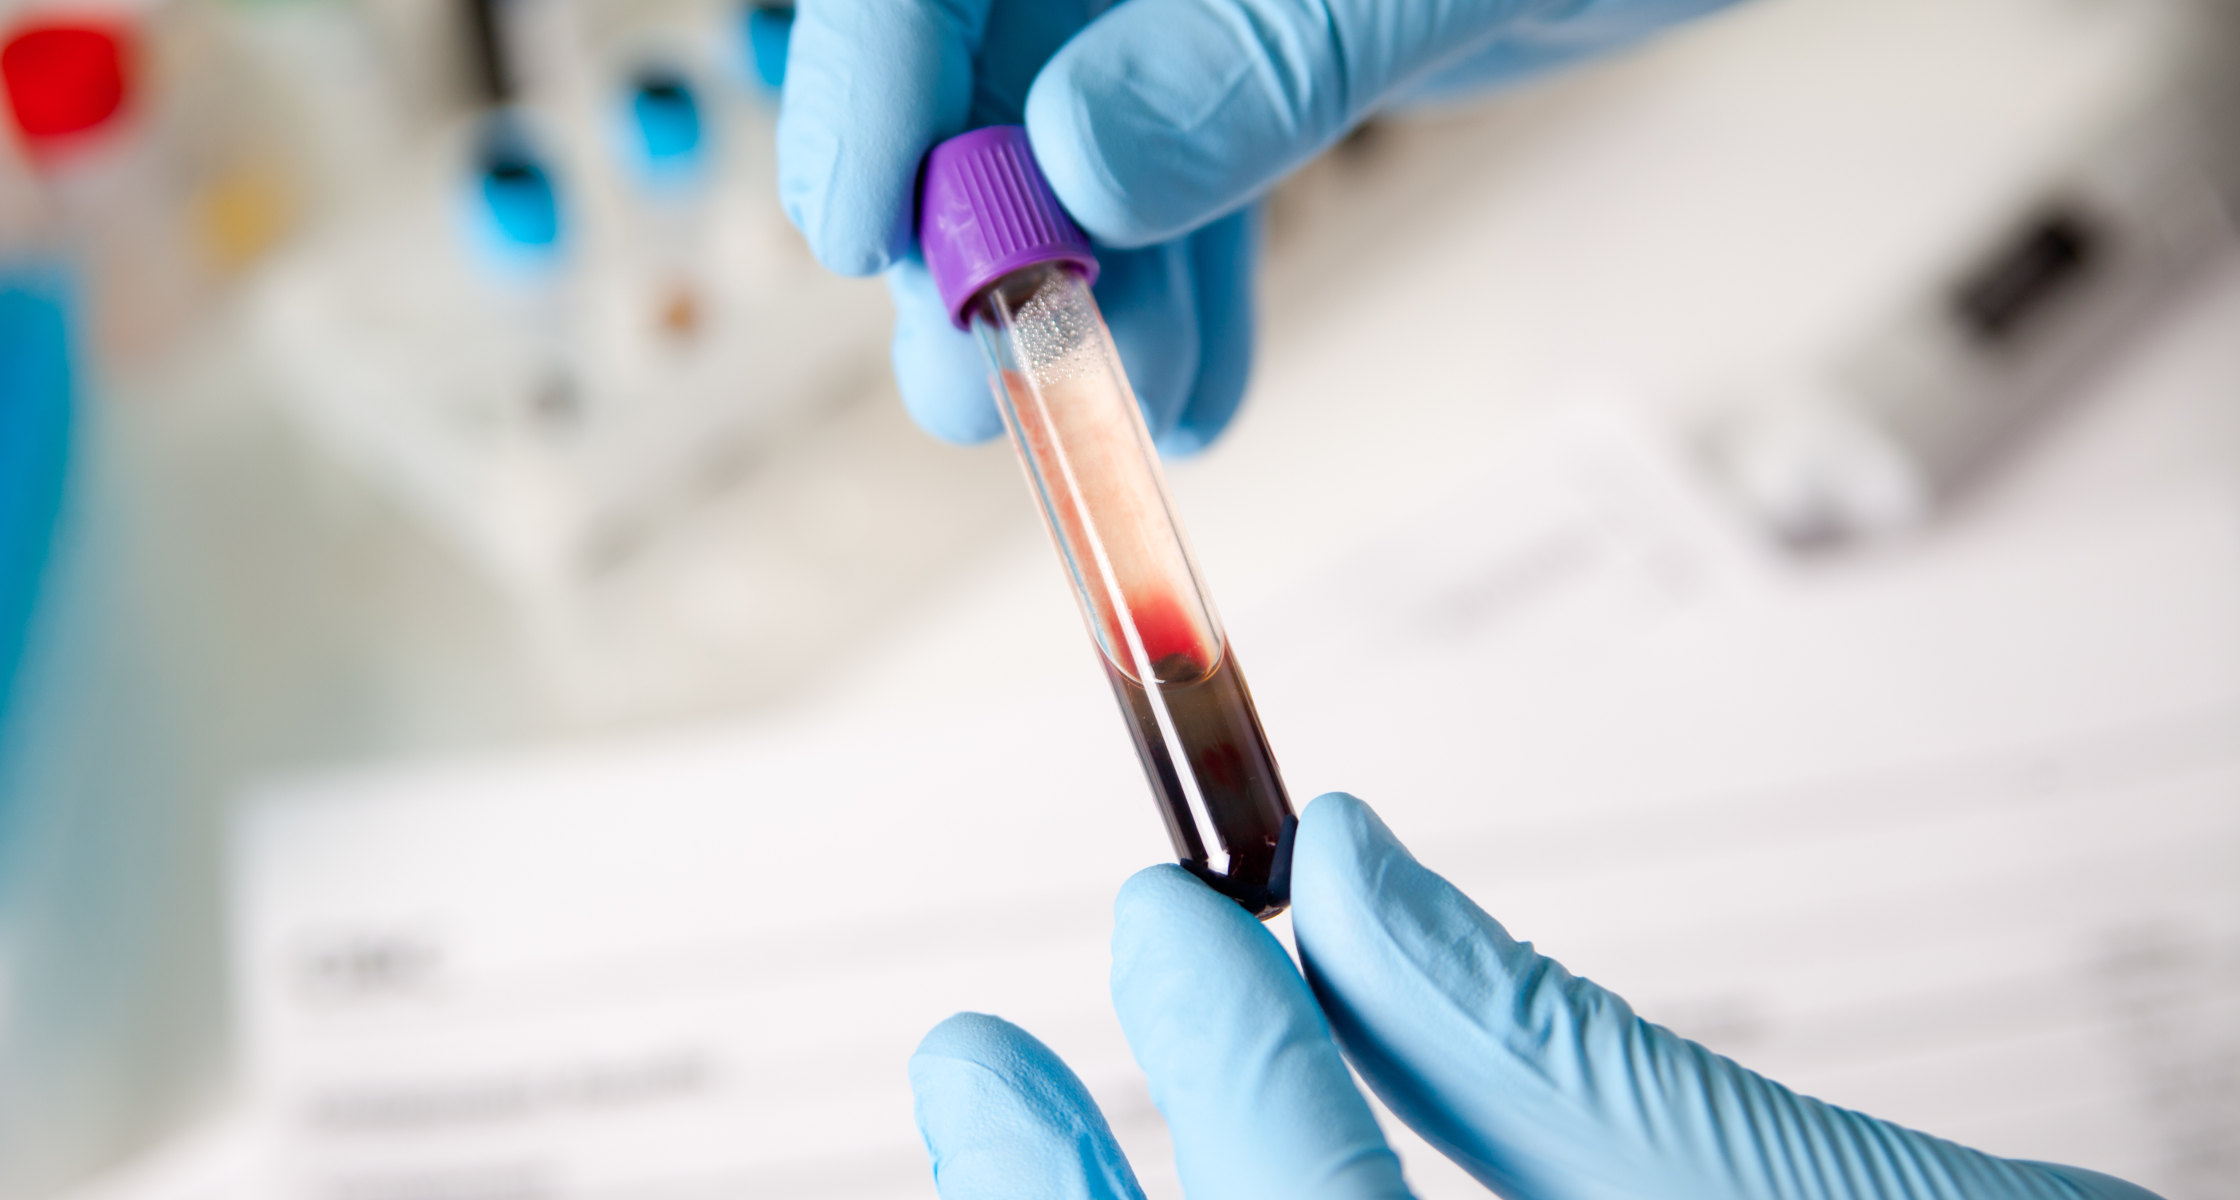 Bluttest Zeigt Frühzeitig Alzheimer Risiko An